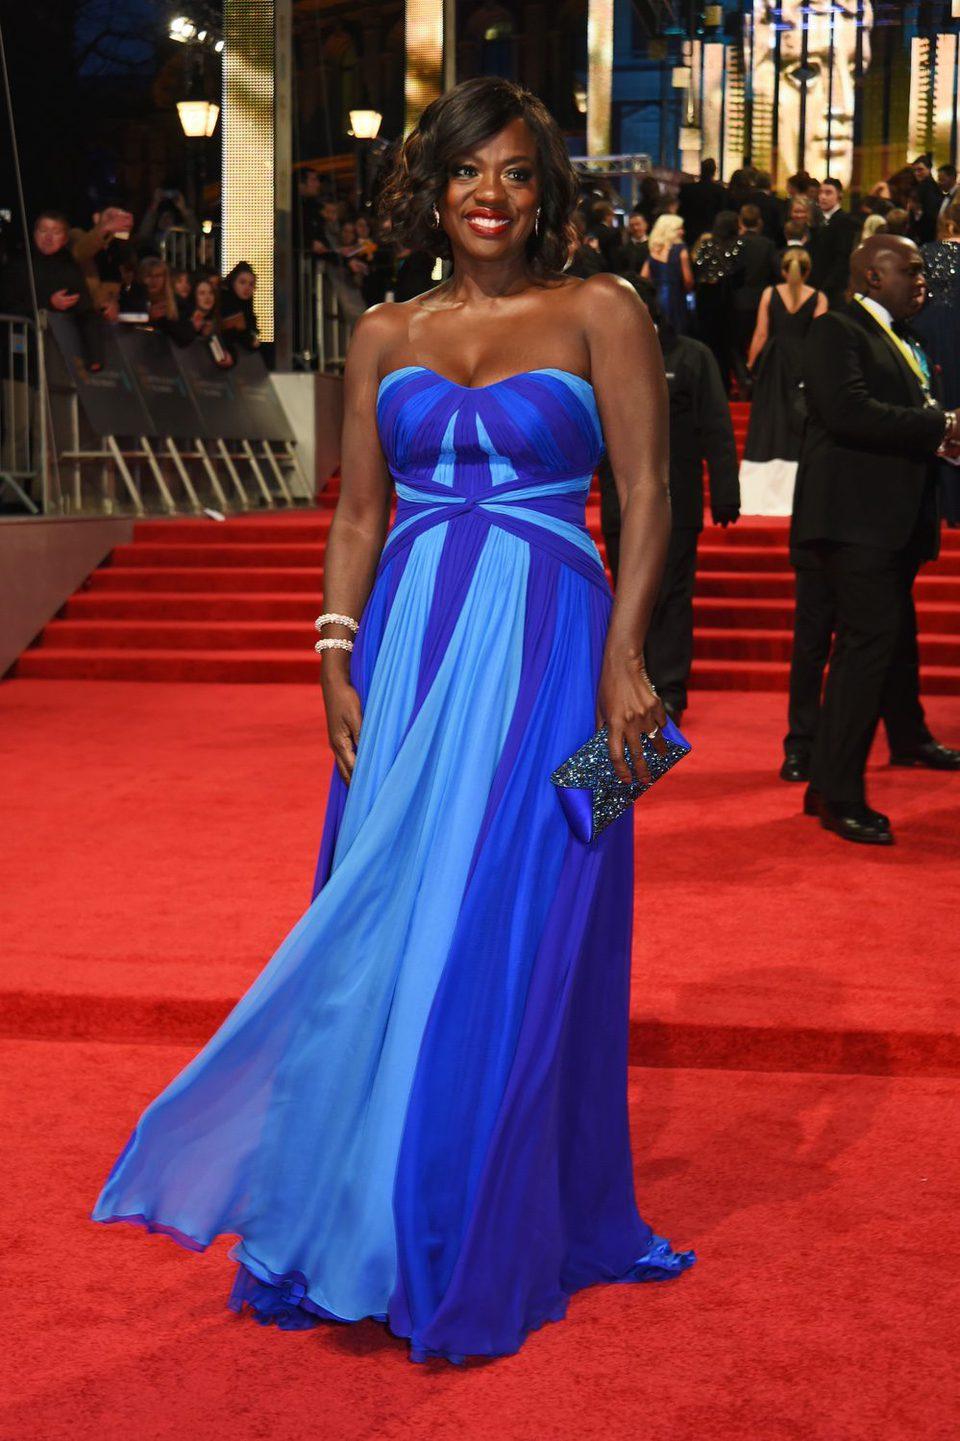 The nominee Viola Davis at the red carpet of BAFTA 2017